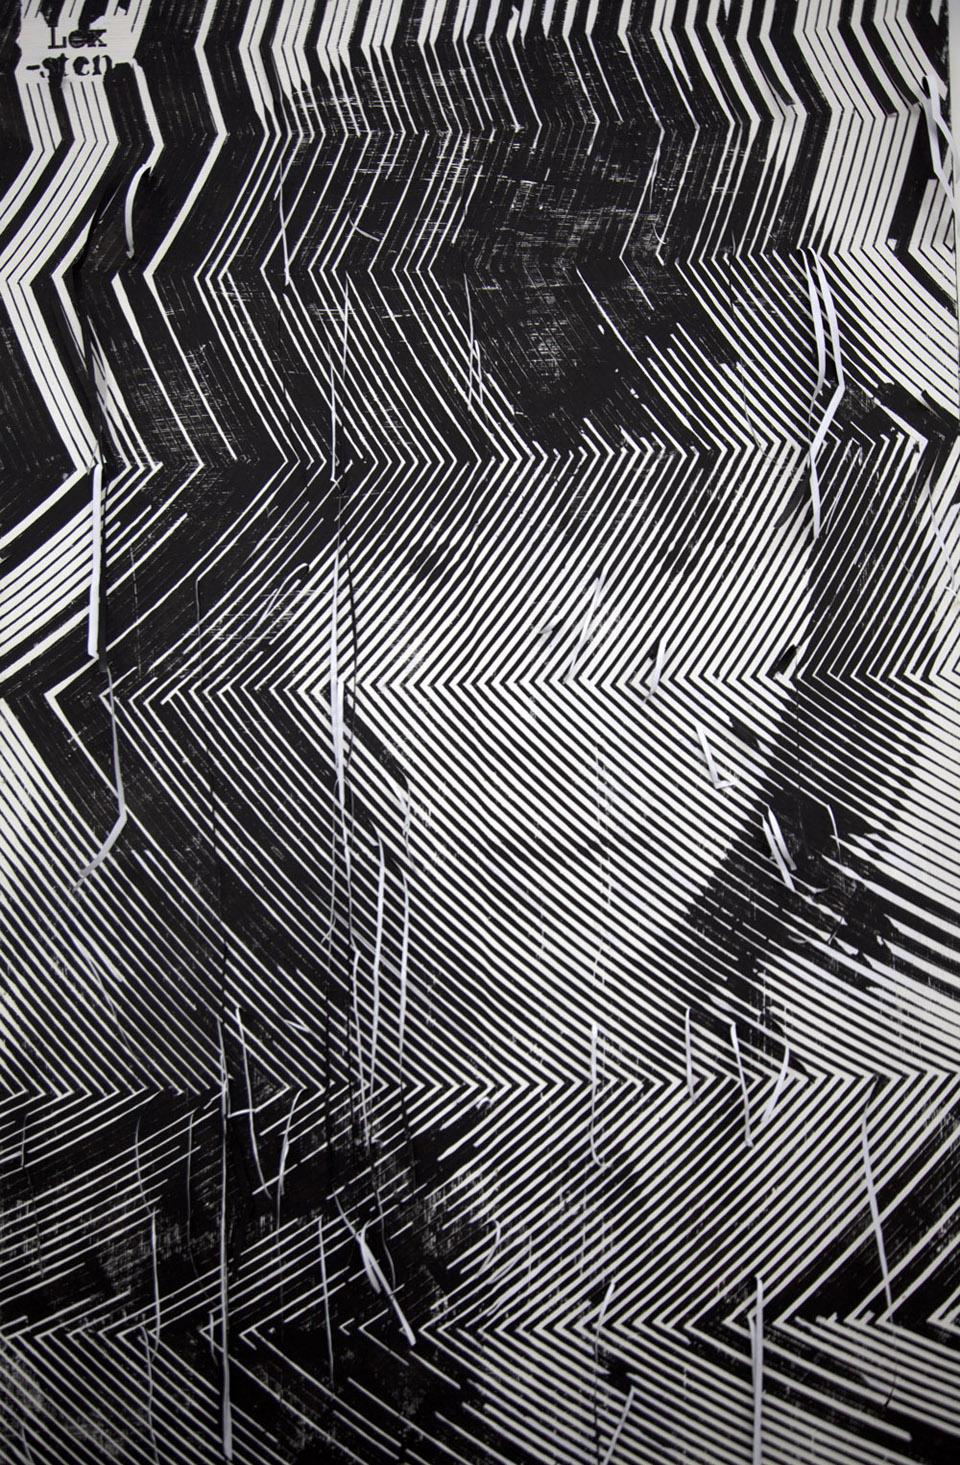 sten-lex-solo-show-at-magda-danysz-gallery-shangai-19